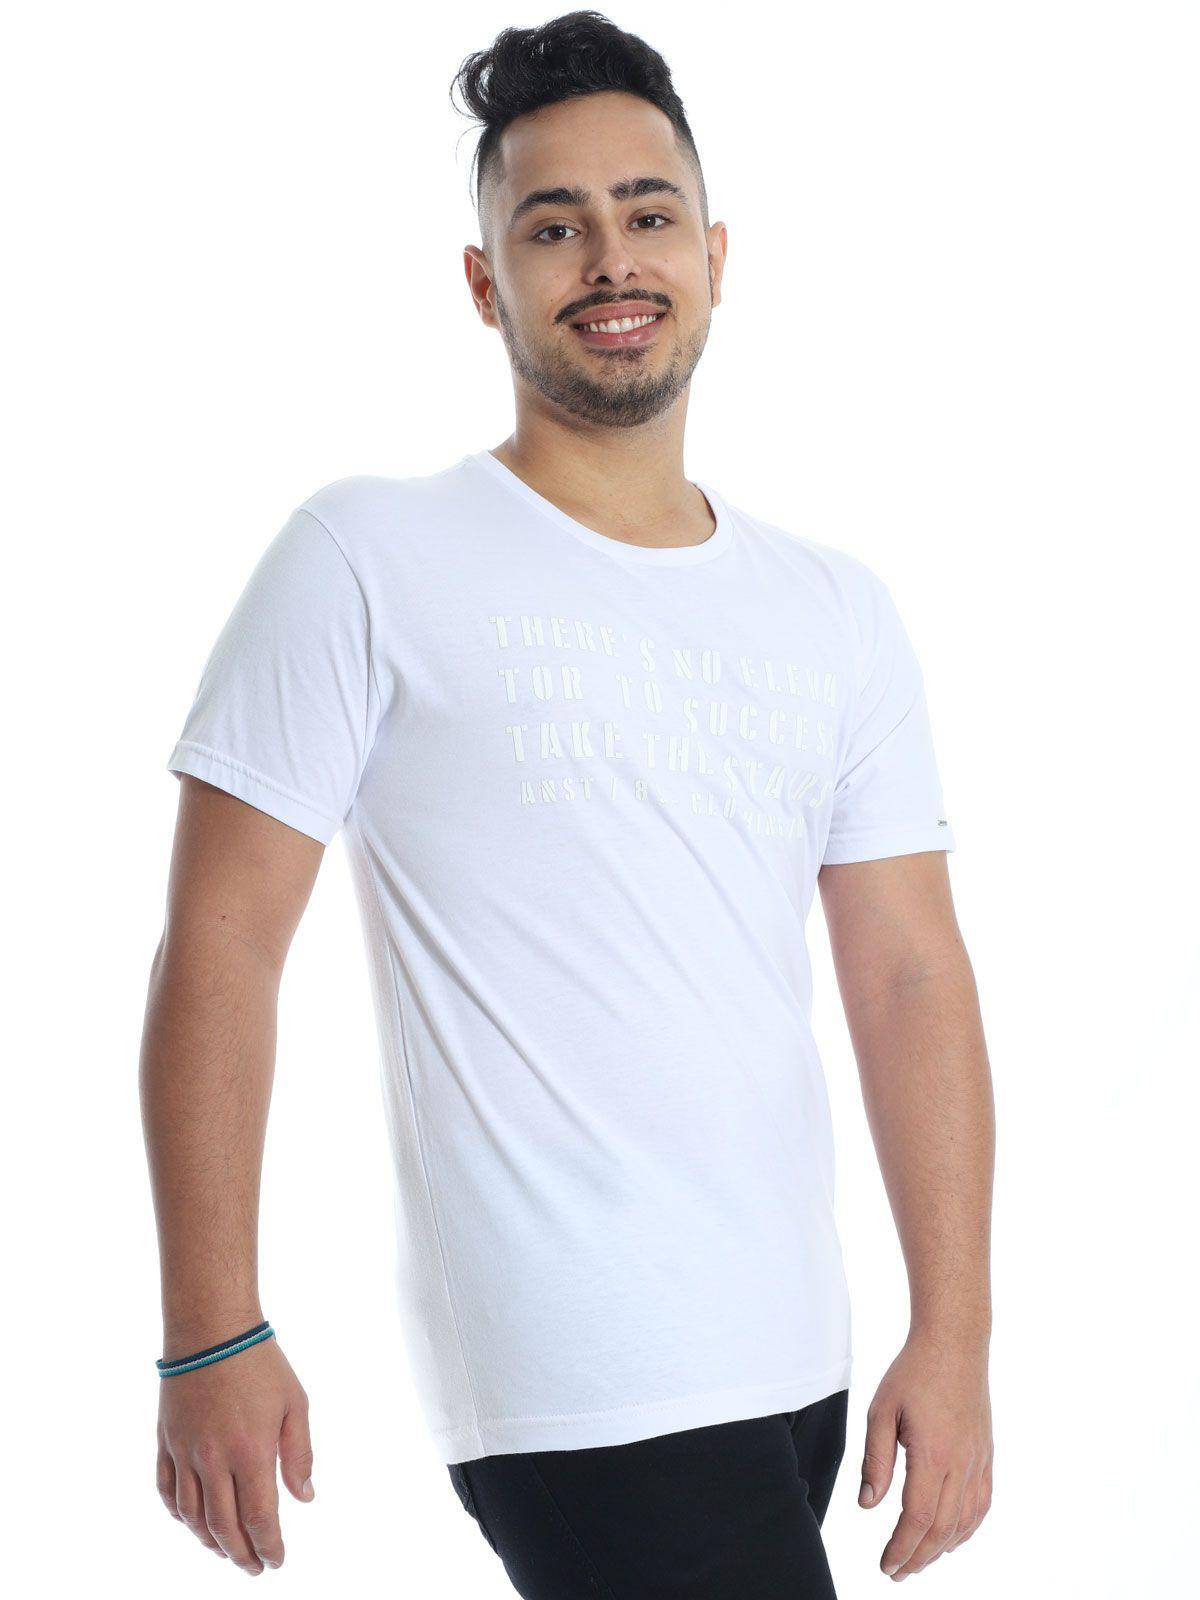 Camiseta Masculina Slim Fit Anistia Elevator Branca